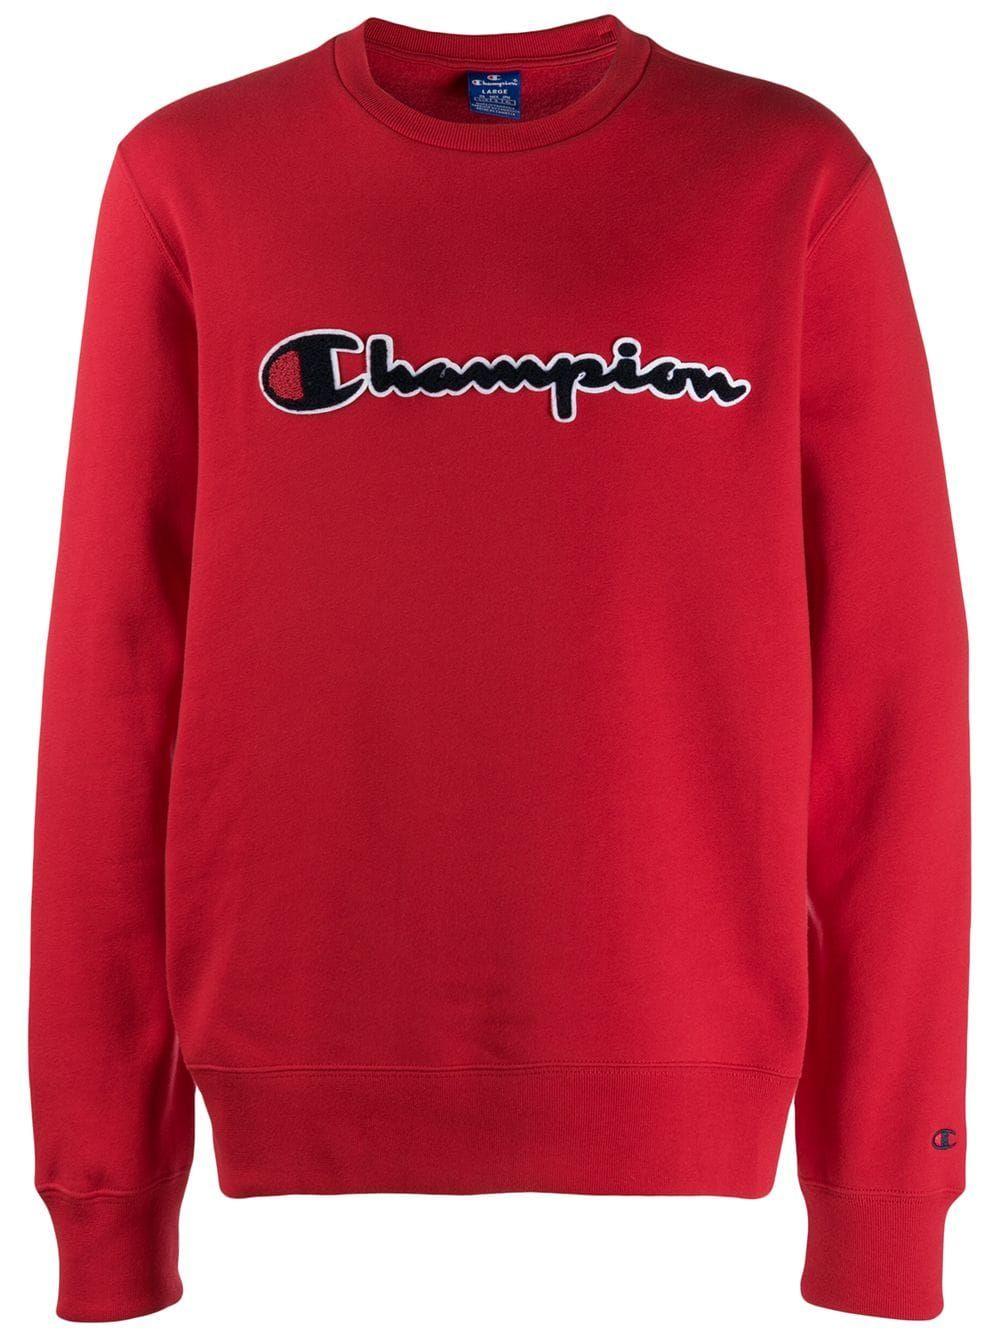 Champion Stitched Logo Sweatshirt Red Sweatshirts Champion Clothing Red Champion Sweatshirt [ 1334 x 1000 Pixel ]